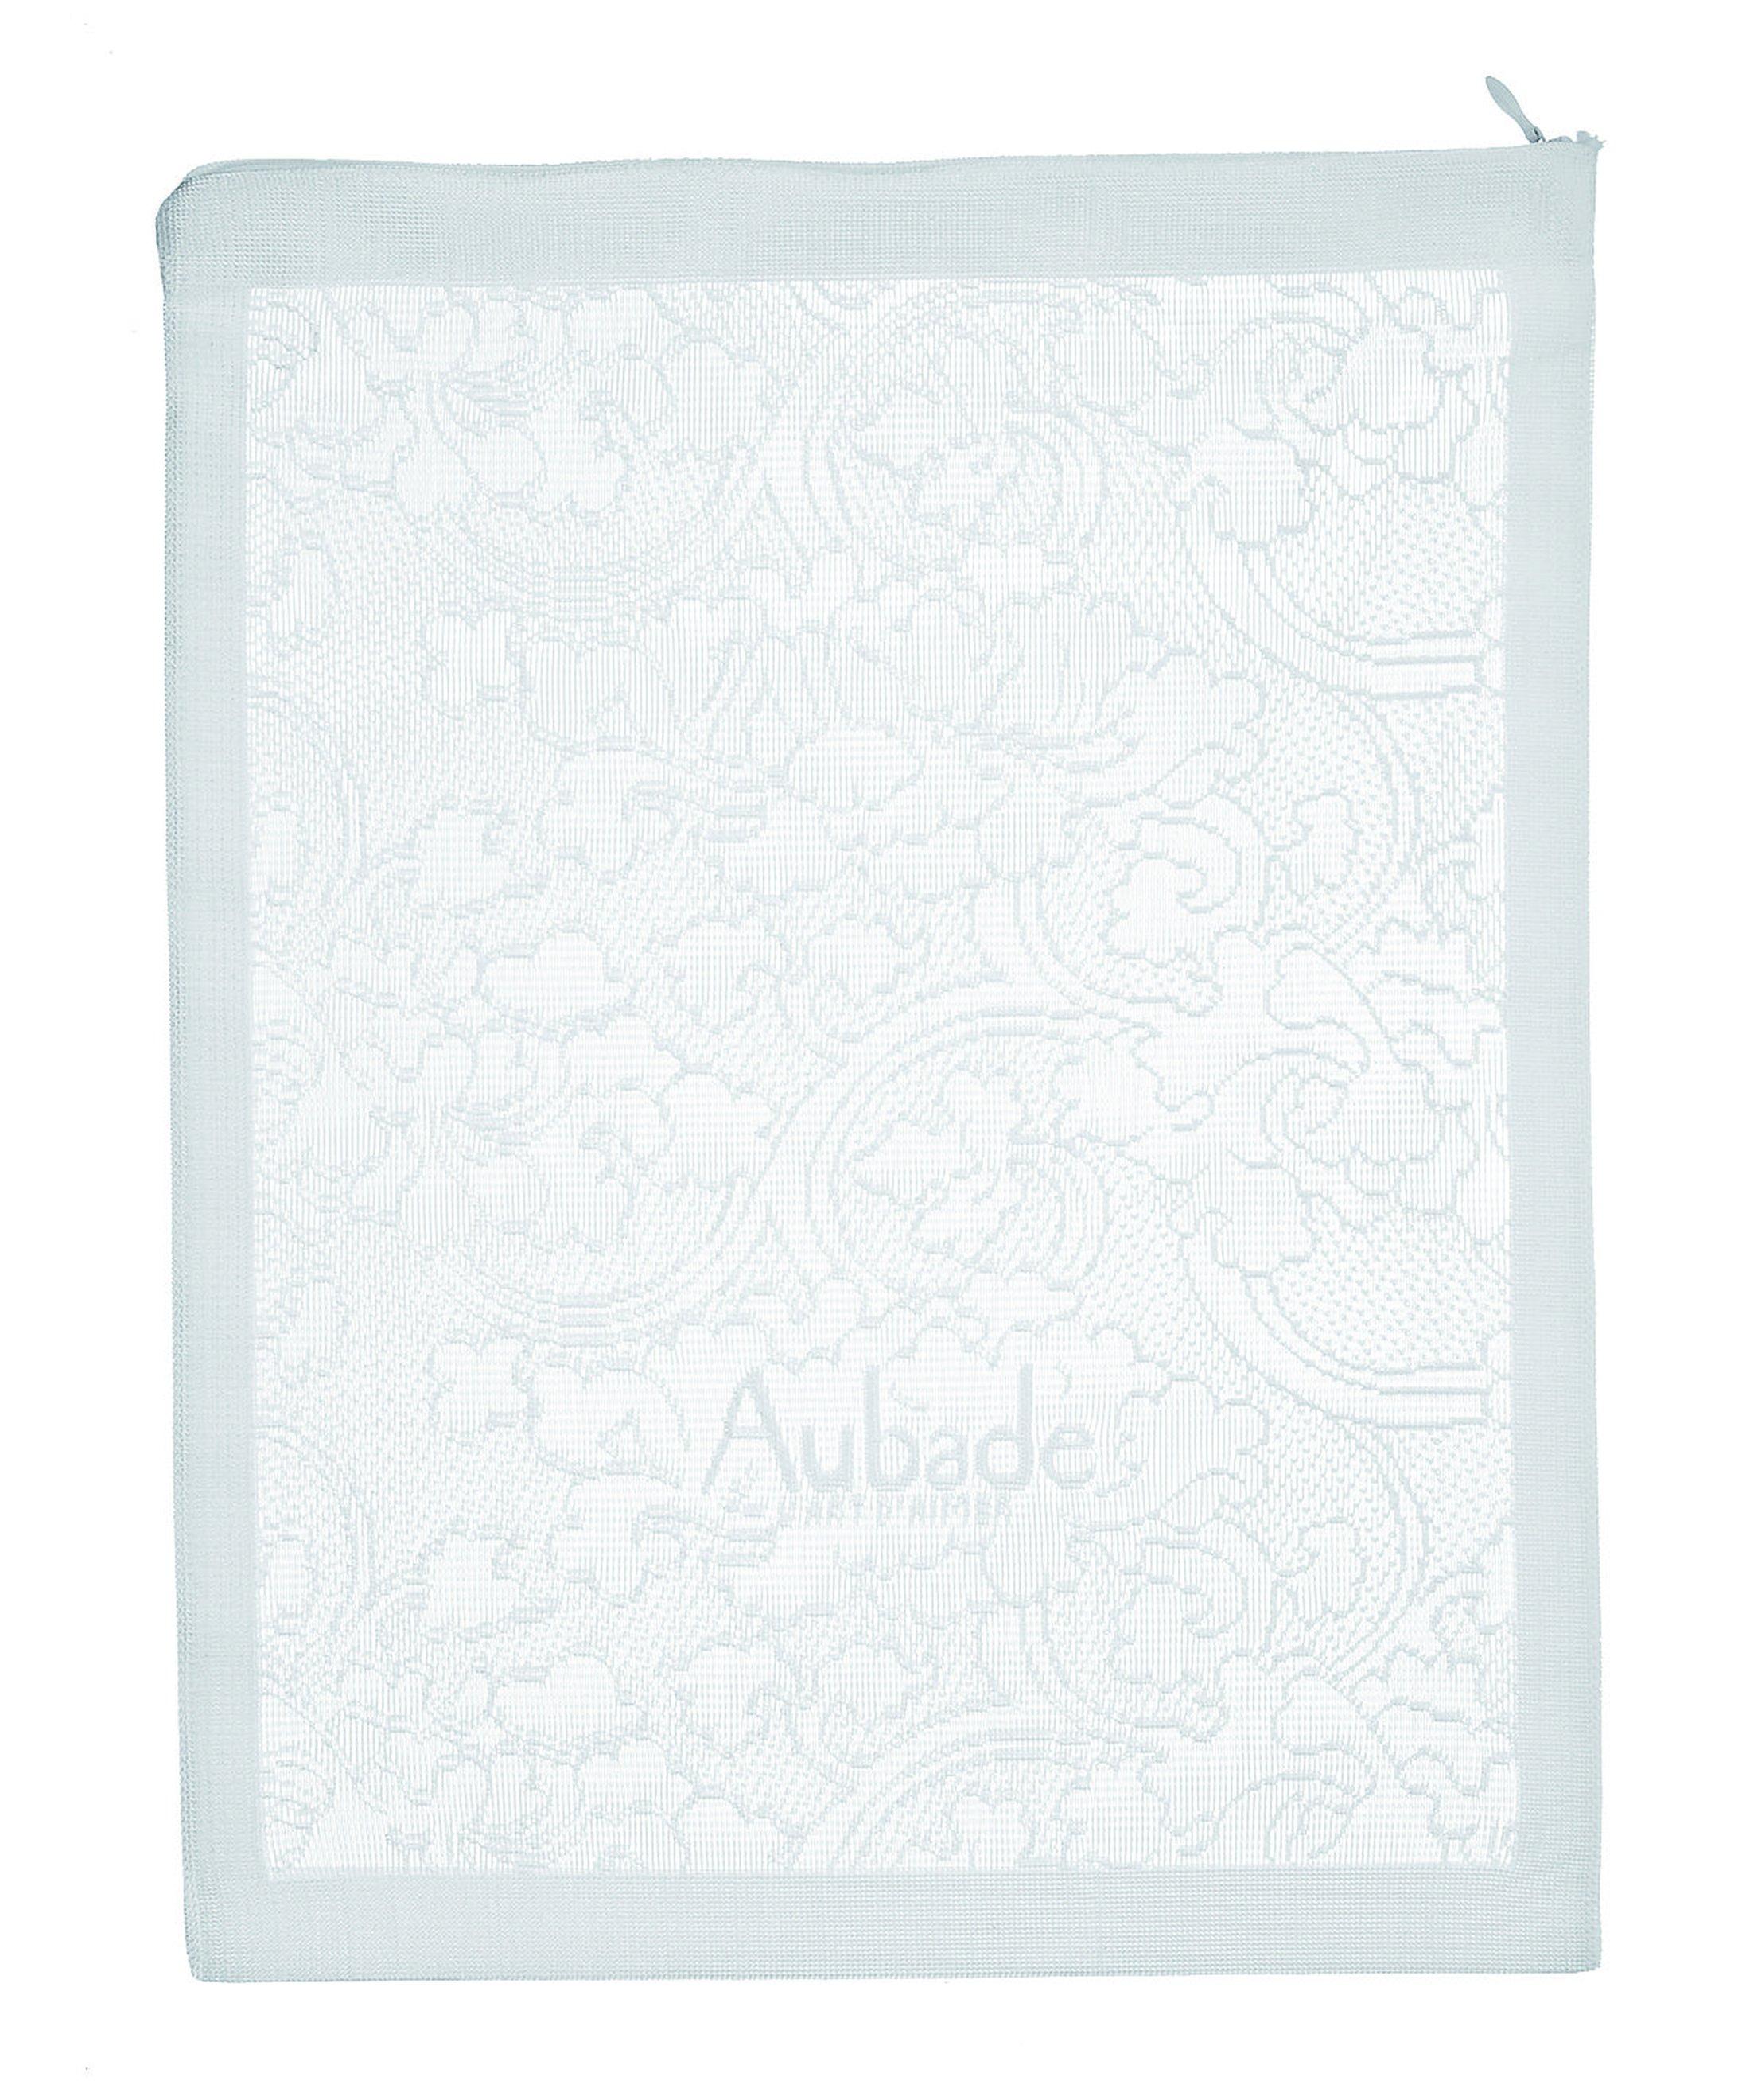 POCHON DE LAVAGE Pochon de lavage Blanc   Aubade